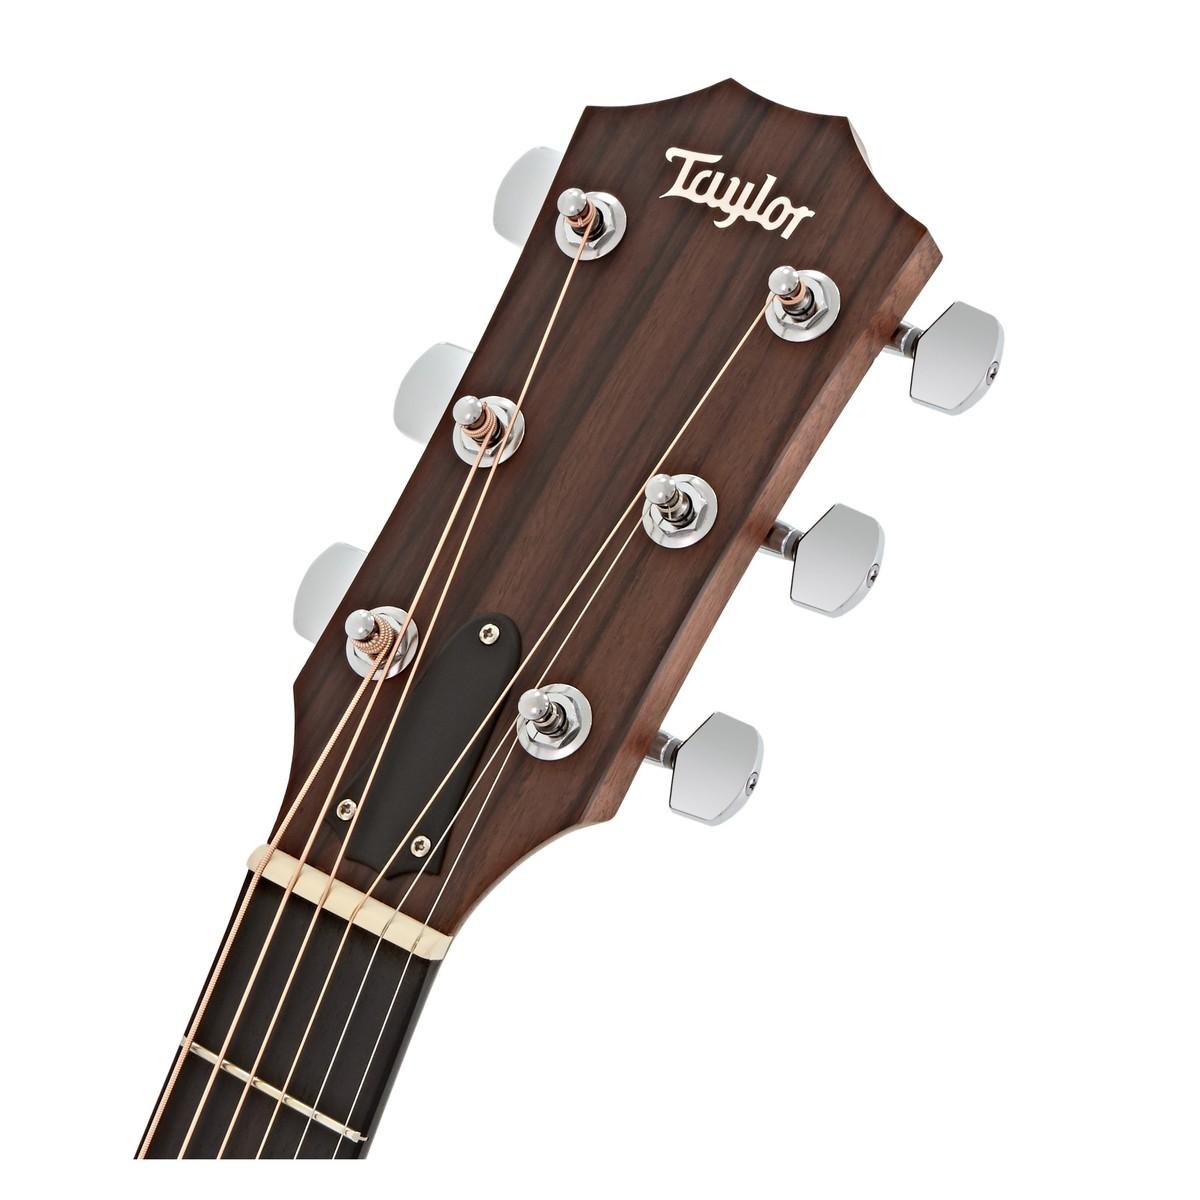 taylor 114ce grand auditorium electro acoustic guitar natural at. Black Bedroom Furniture Sets. Home Design Ideas